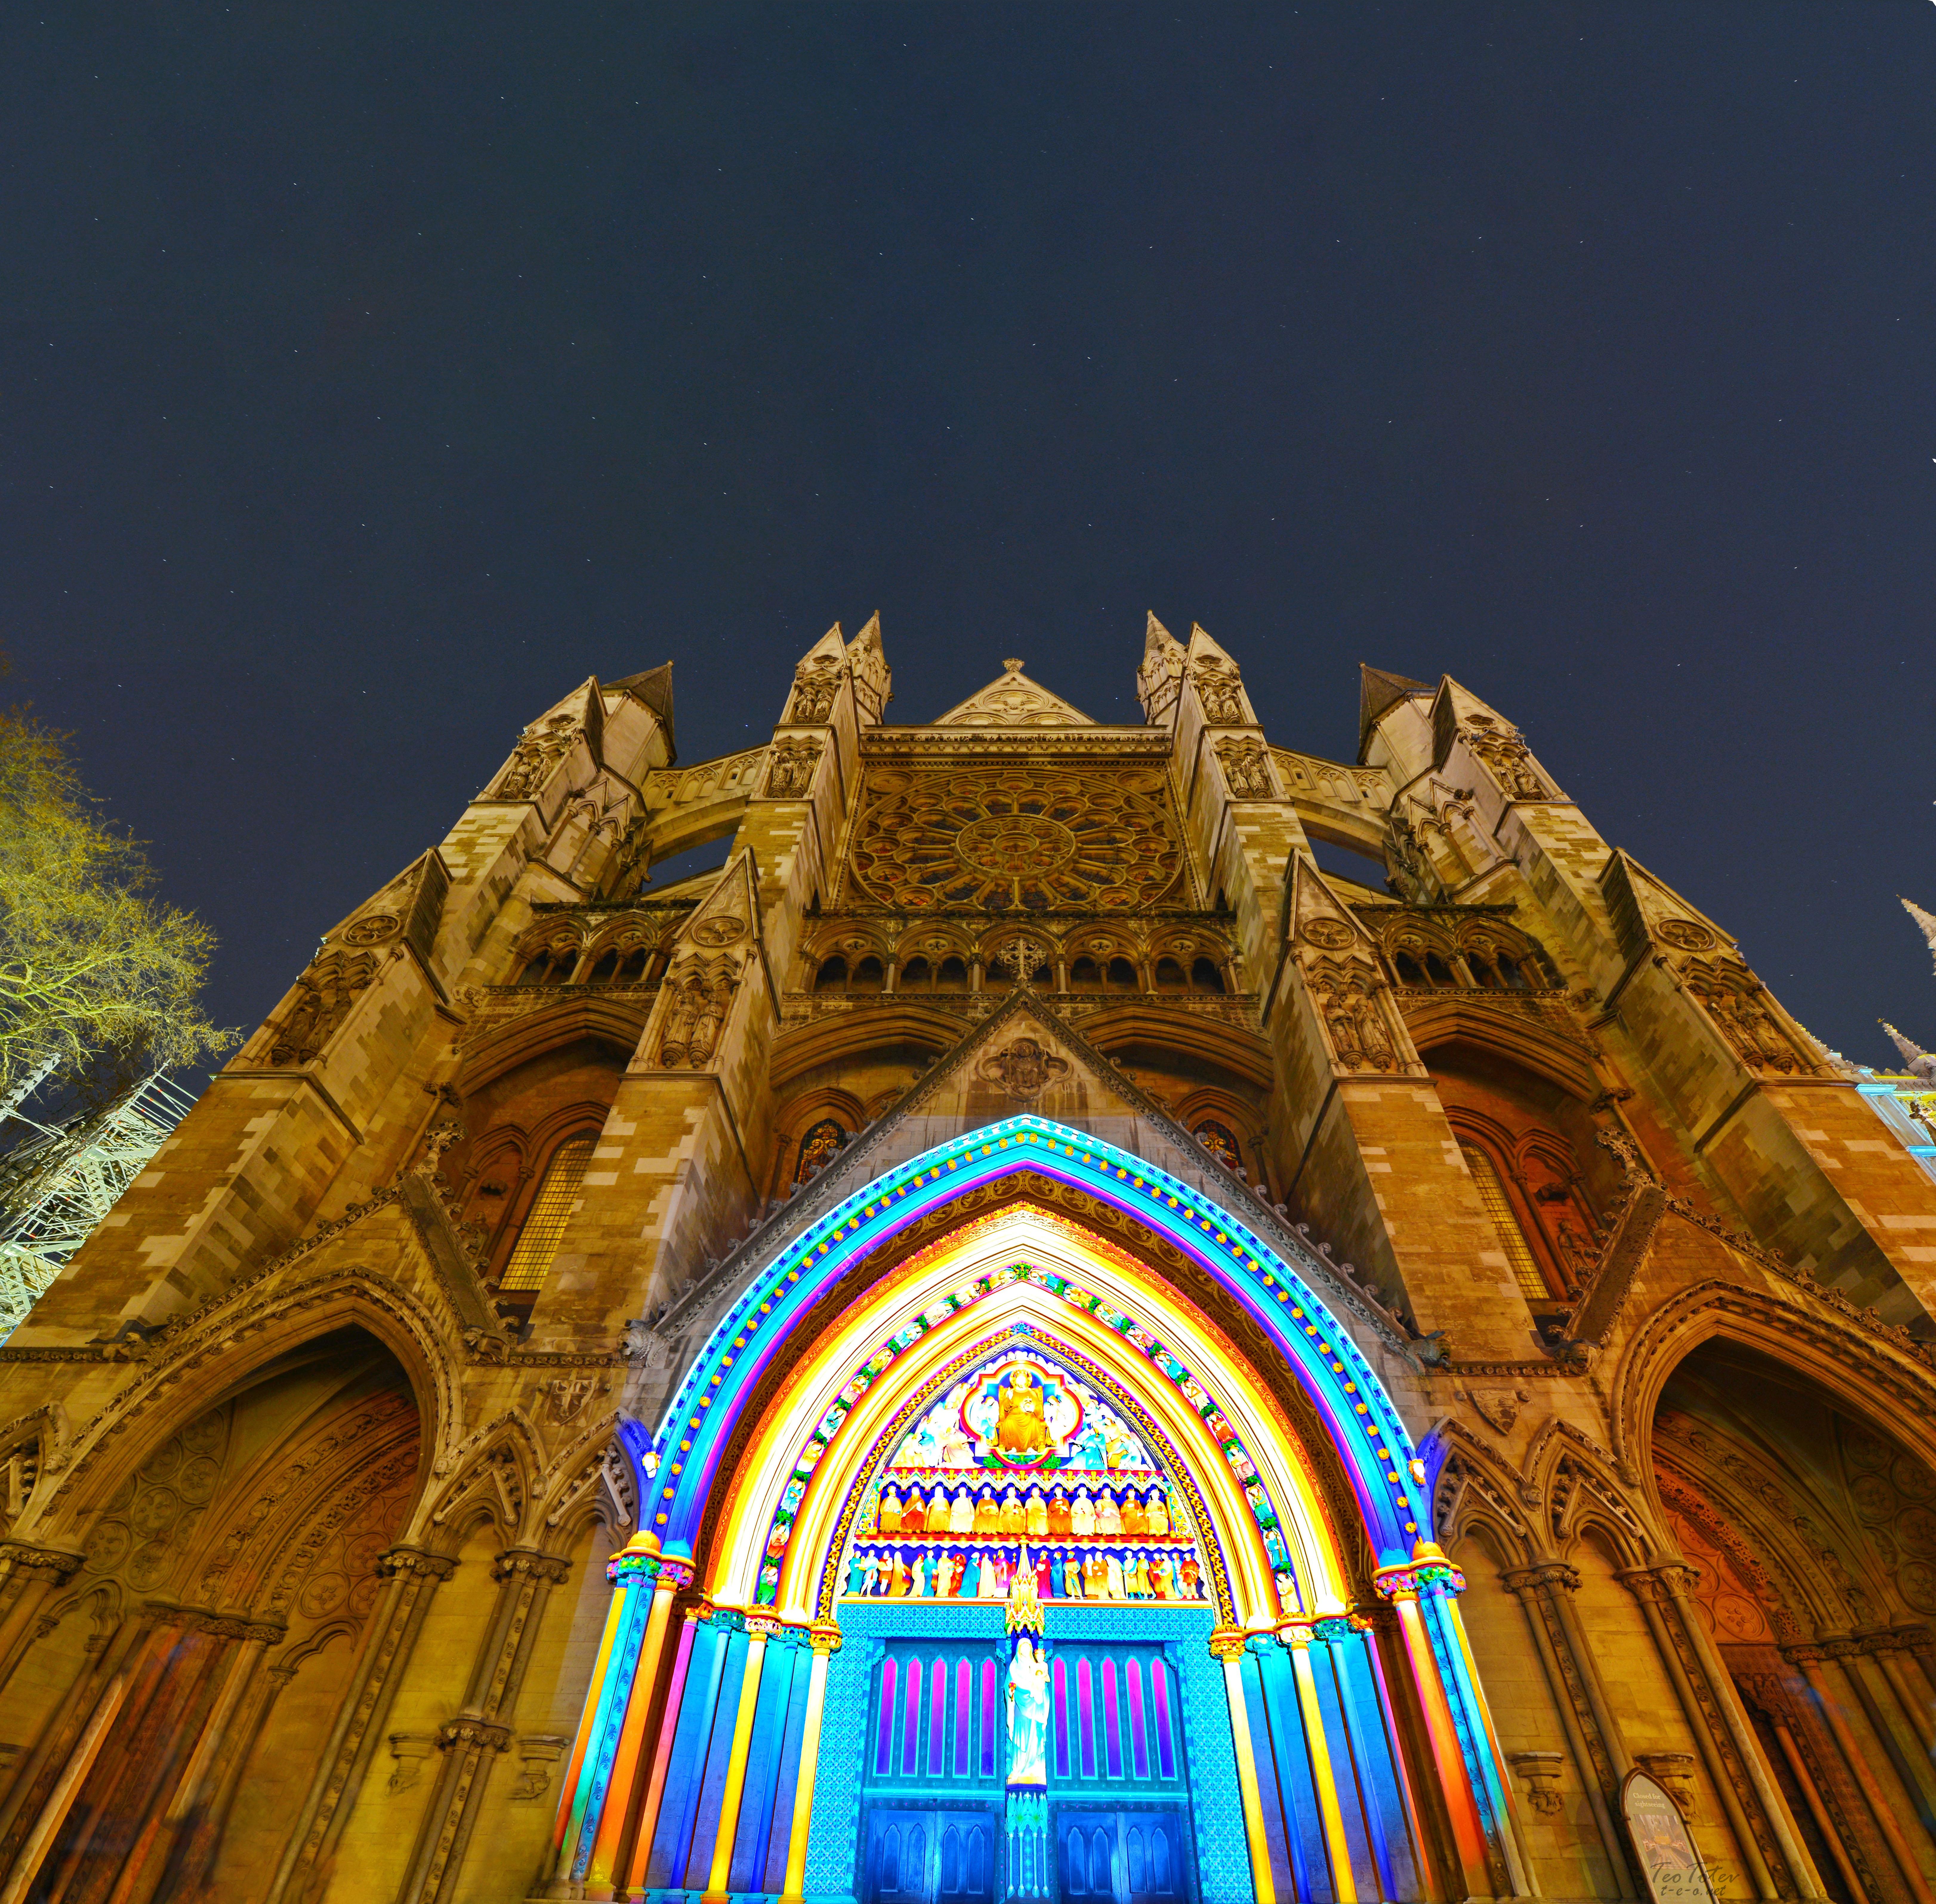 Westminster Abbey Night Sky